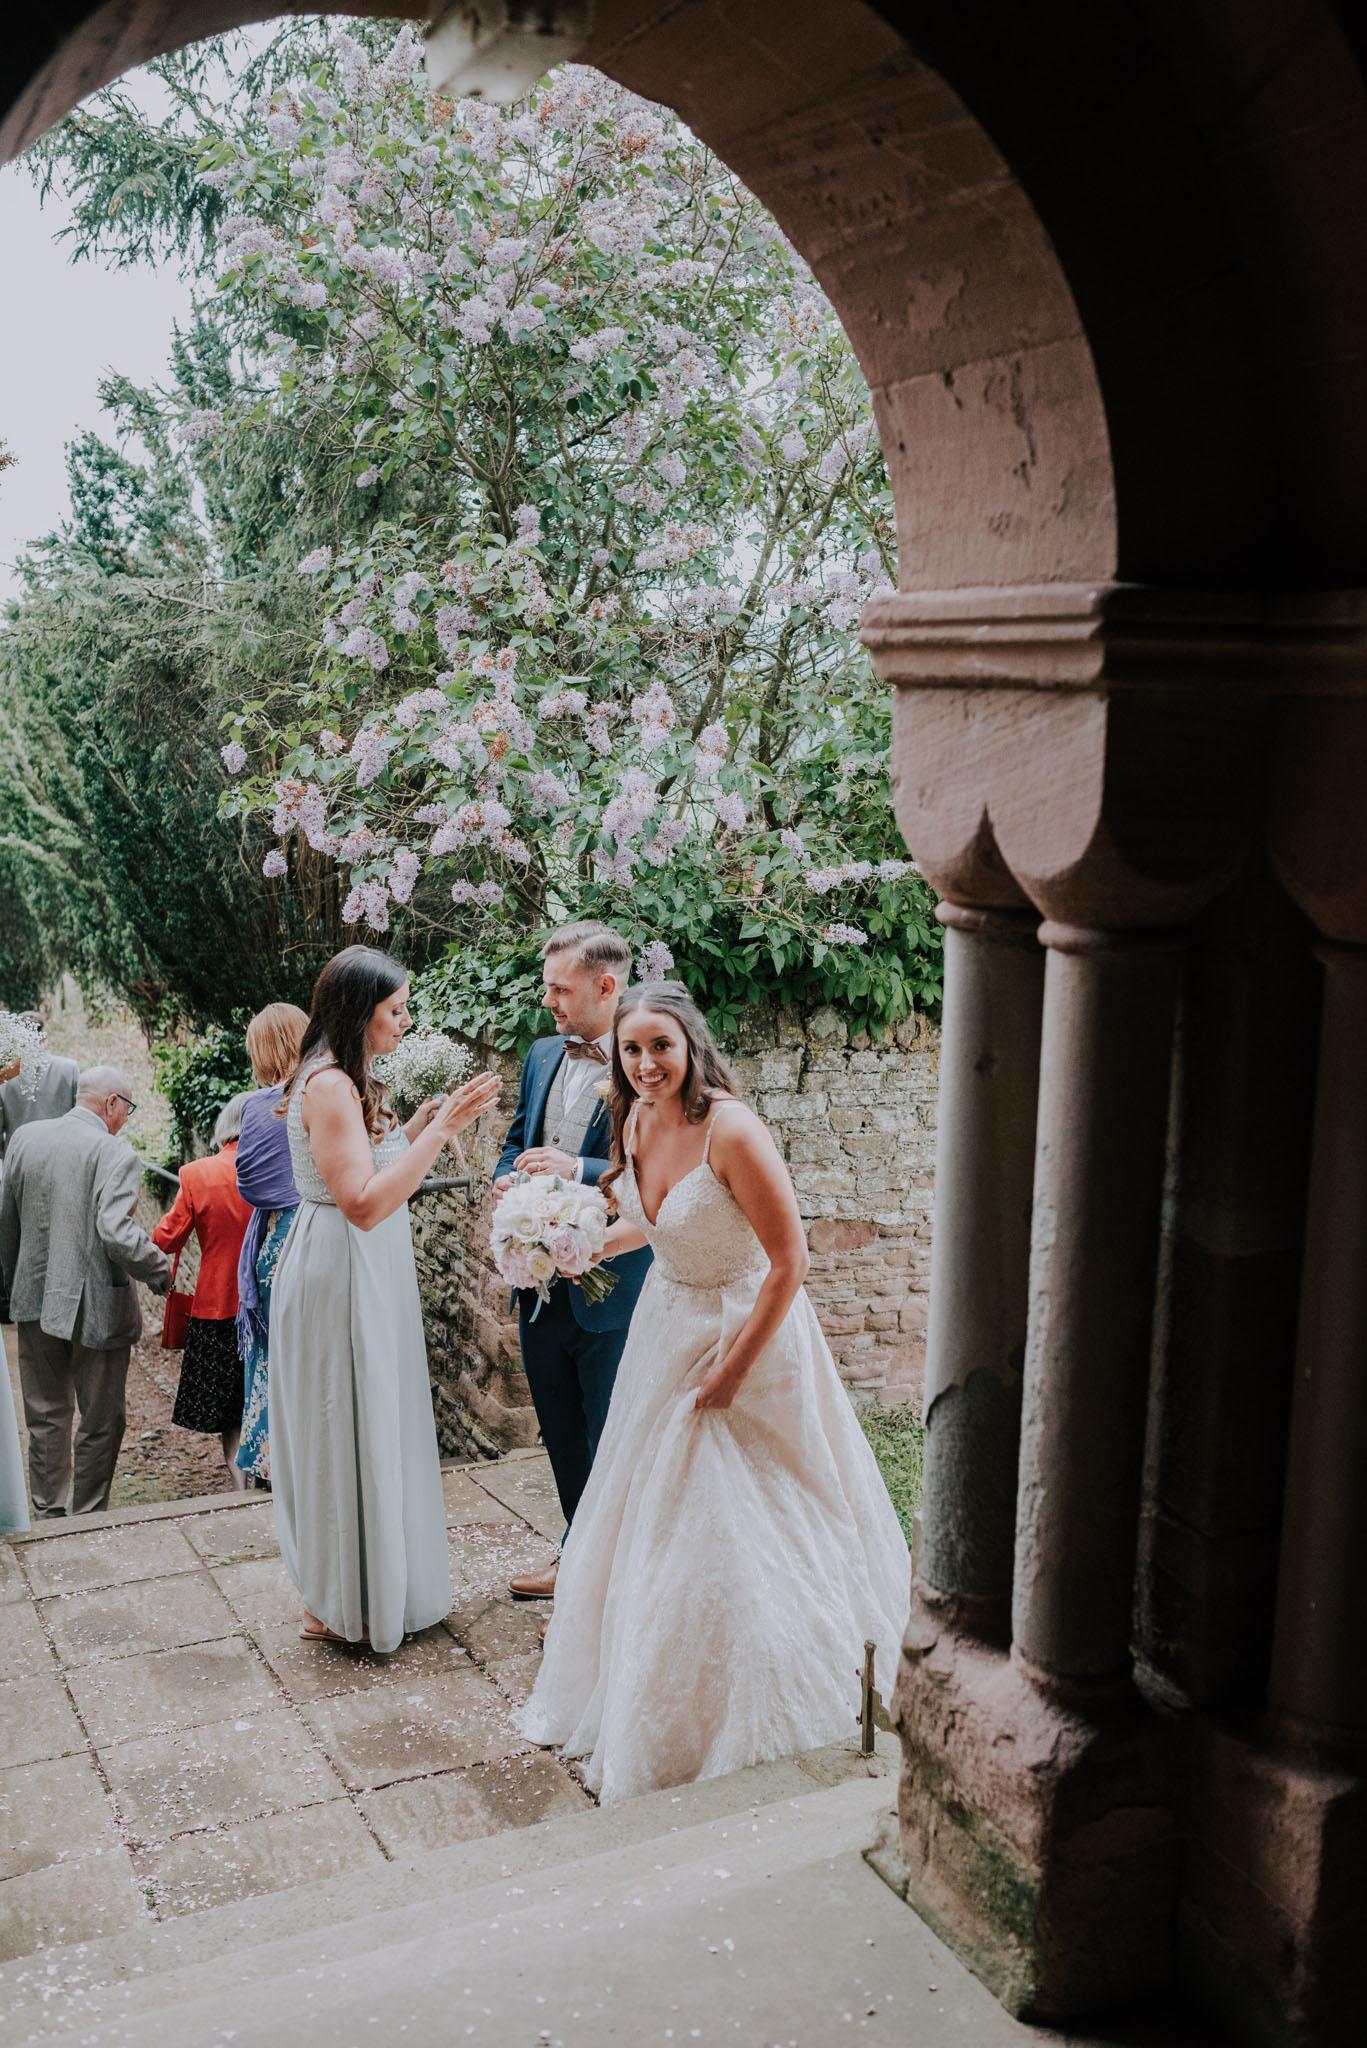 wedding-photographer-glewstone-court-hereford-scott-stockwell-photography272.jpg